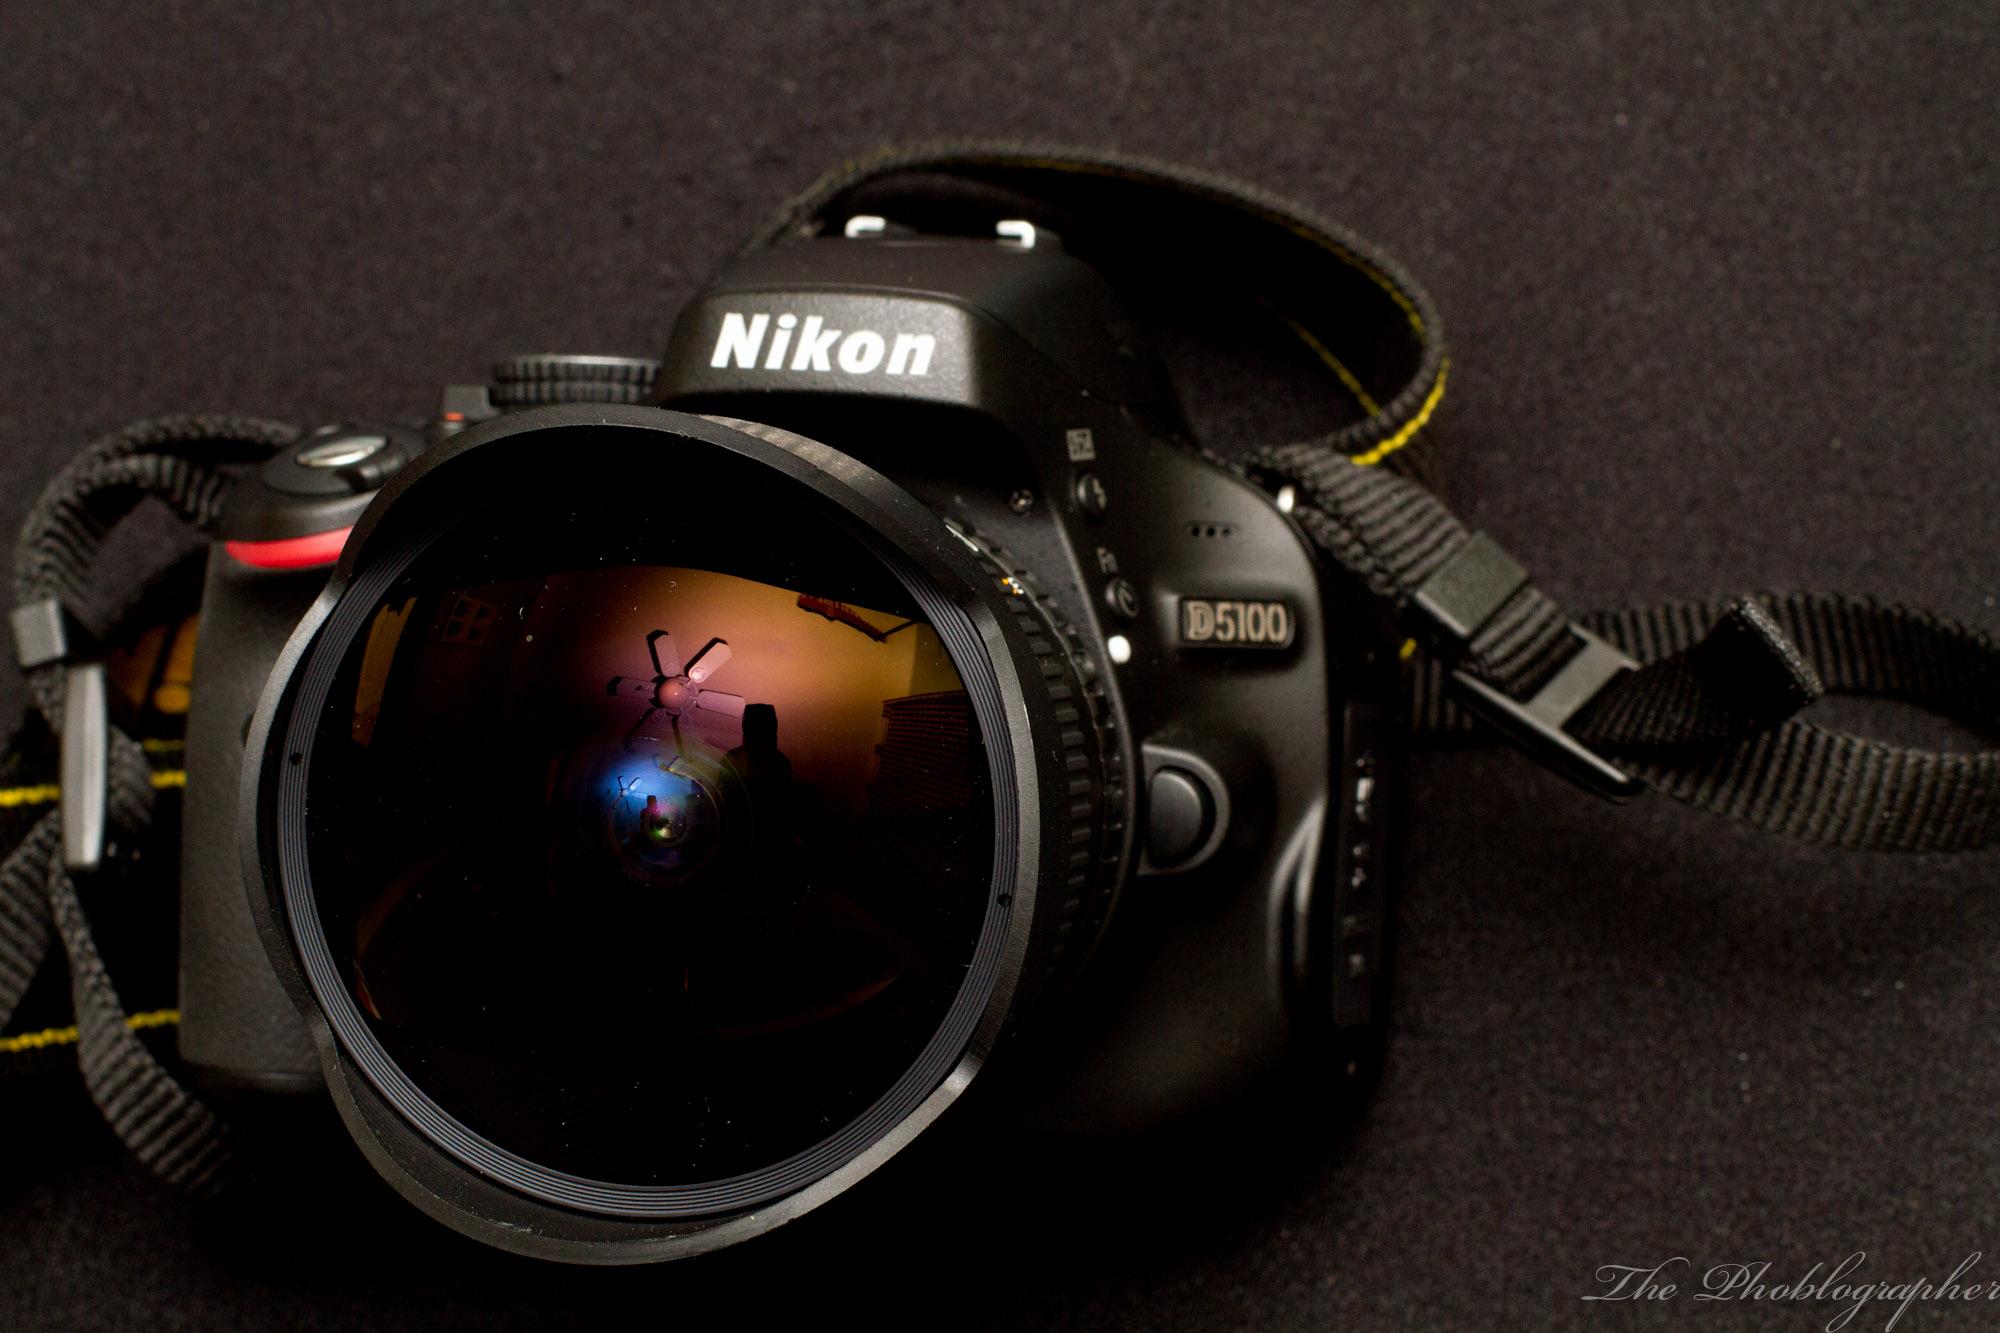 Chris Gampat The Phoblographer rokinon 8mm lens for nikon product photos (2 of 3)